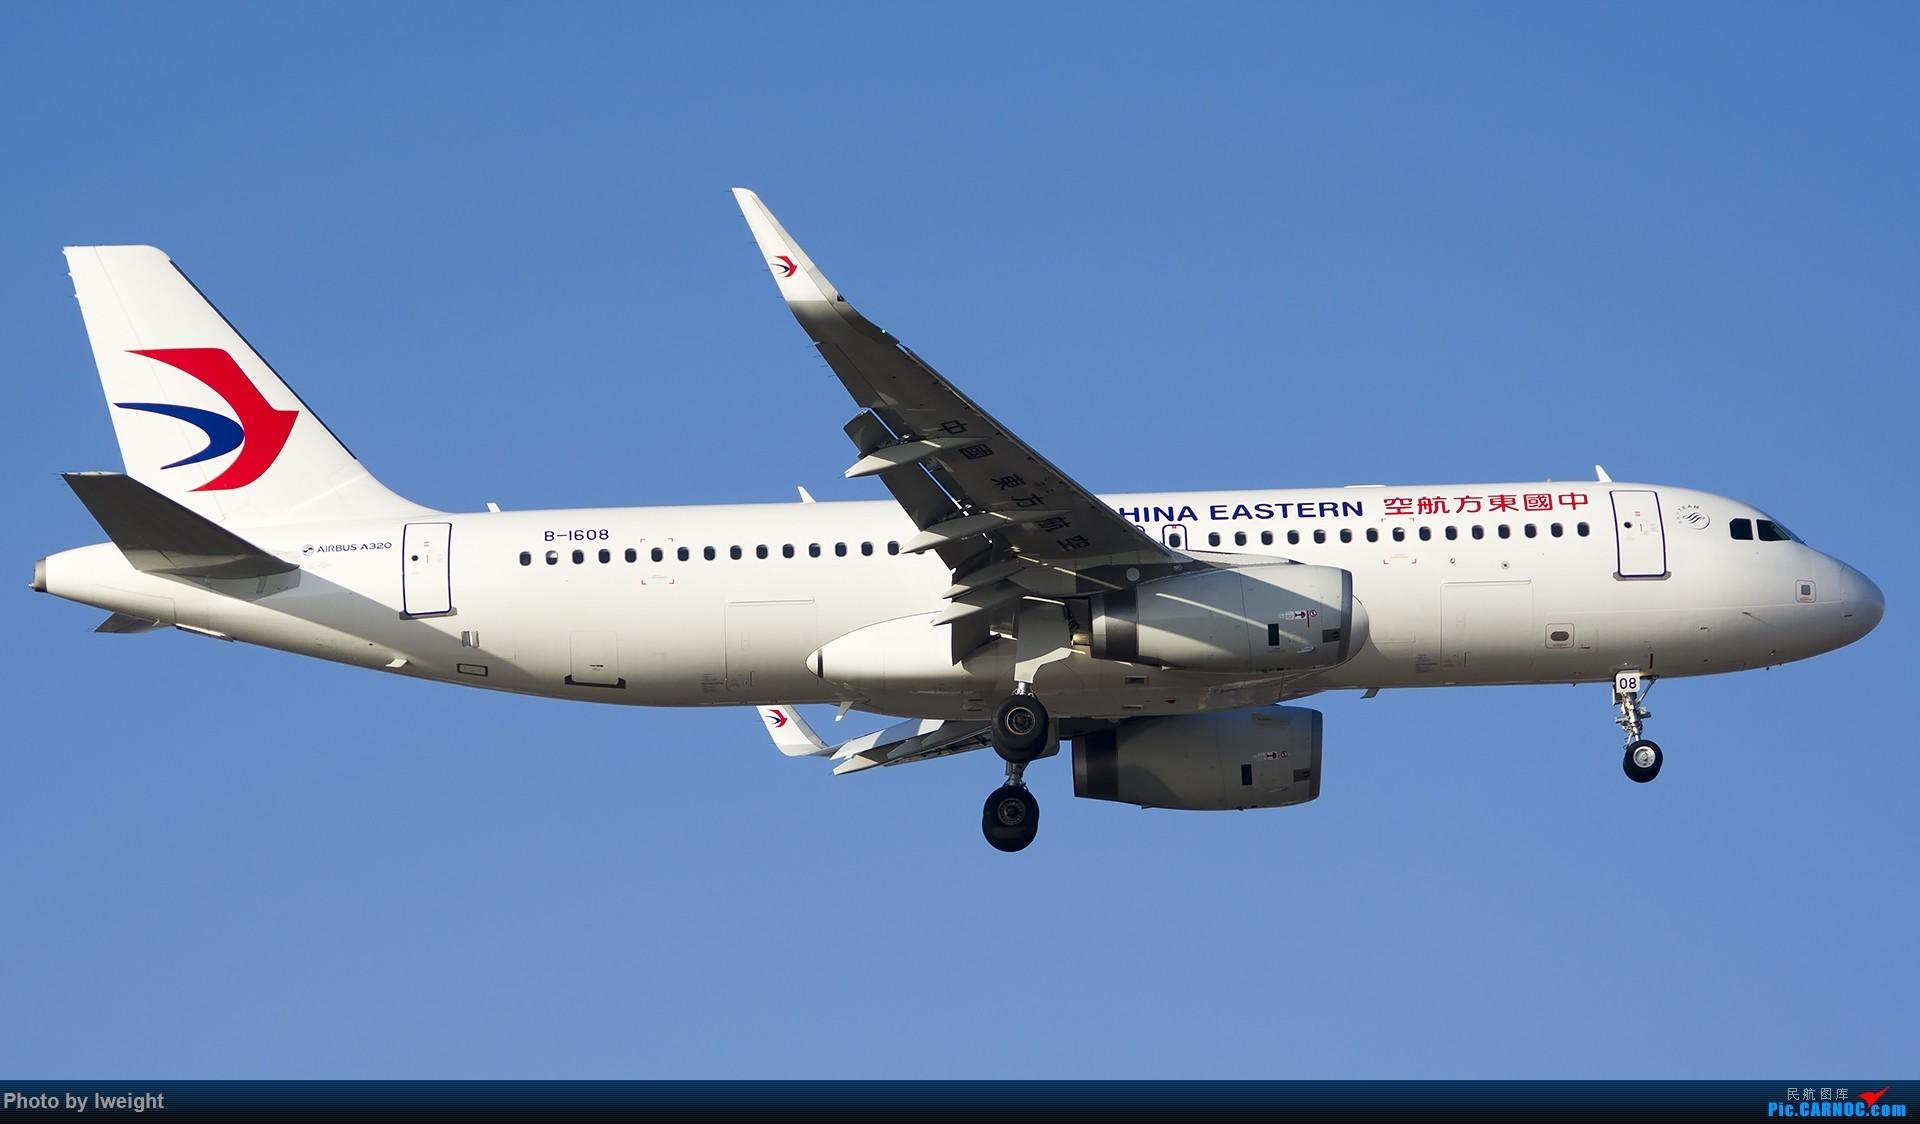 Re:[原创]庆祝升级777,发上今天在首都机场拍的所有飞机【2014-12-14】 AIRBUS A320-200 B-1608 中国北京首都国际机场